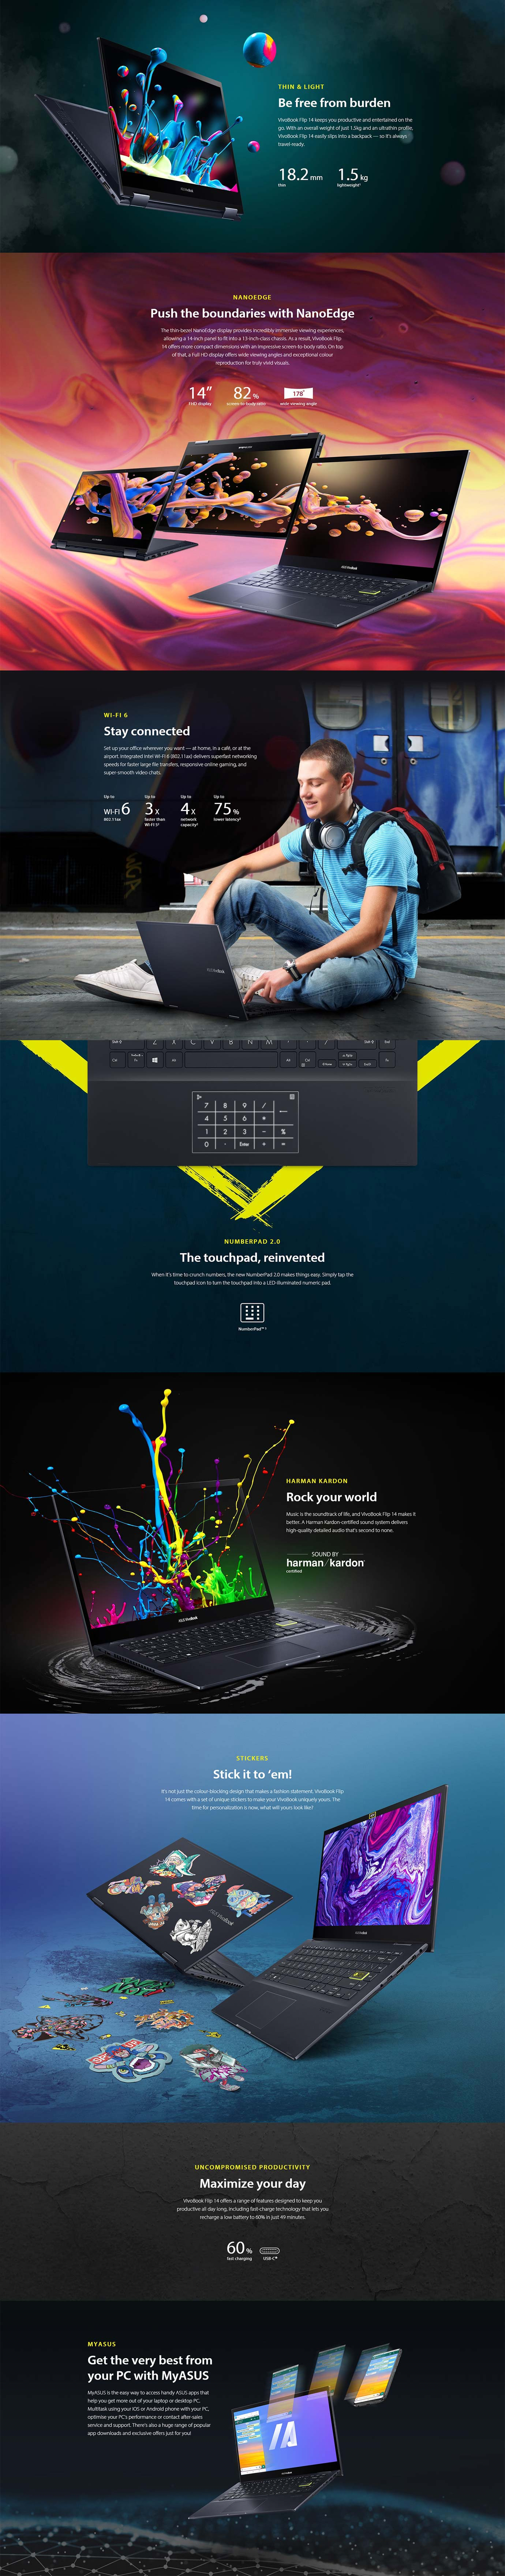 Asus VivoBook Flip 14 TM420 Laptop